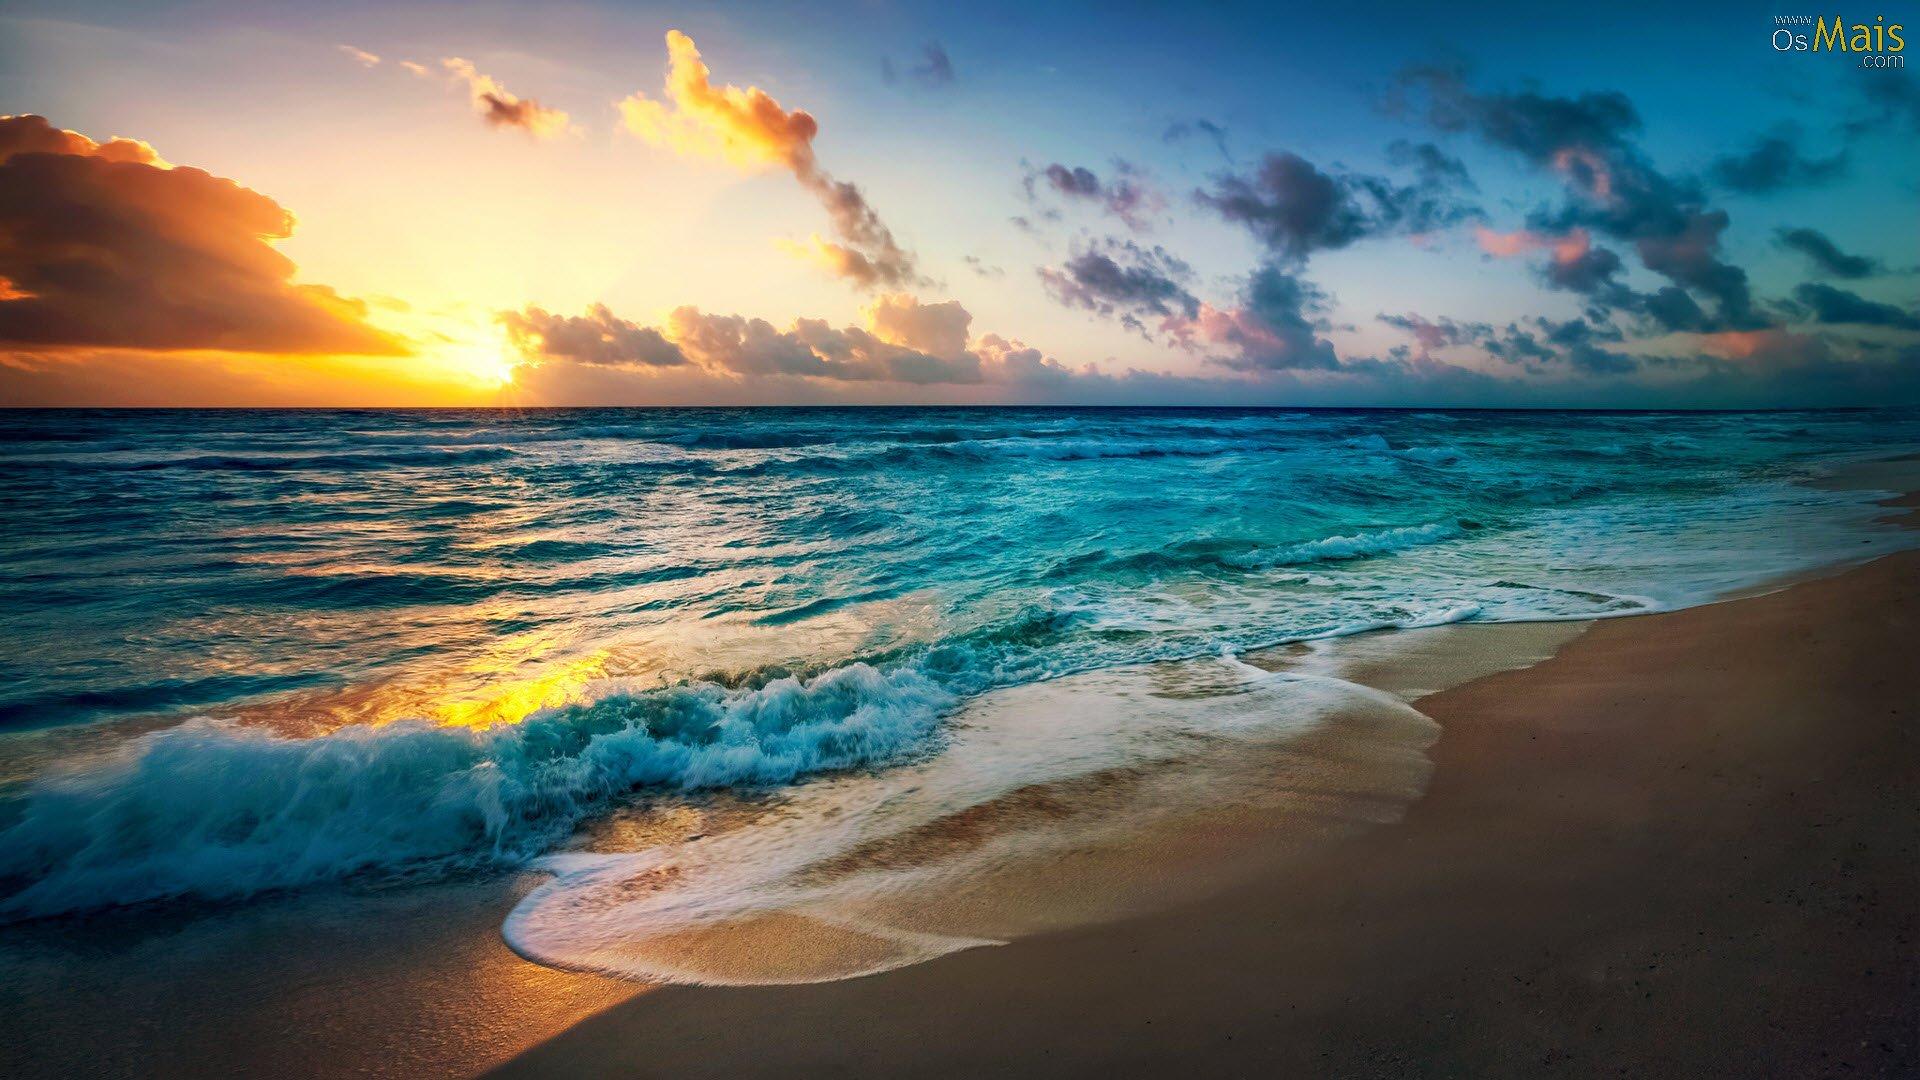 Praia Wallpaper Ocean And Sun 616833 Hd Wallpaper